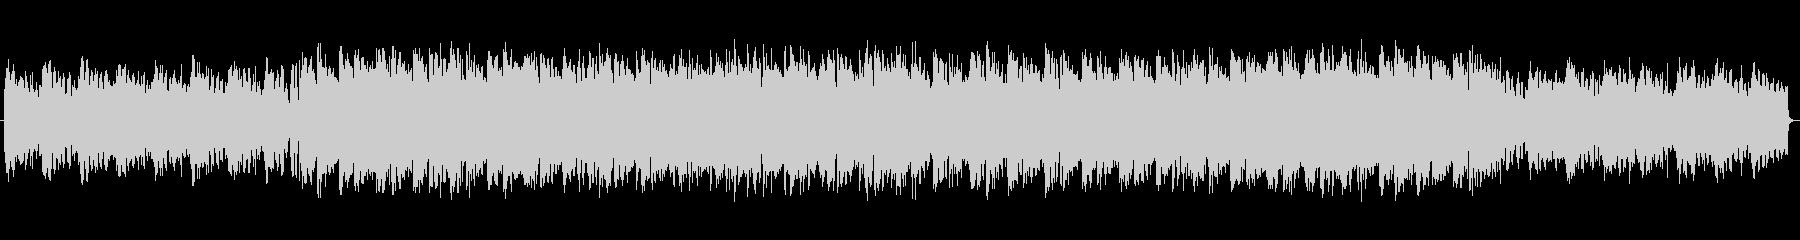 LofiエレピBGMの未再生の波形